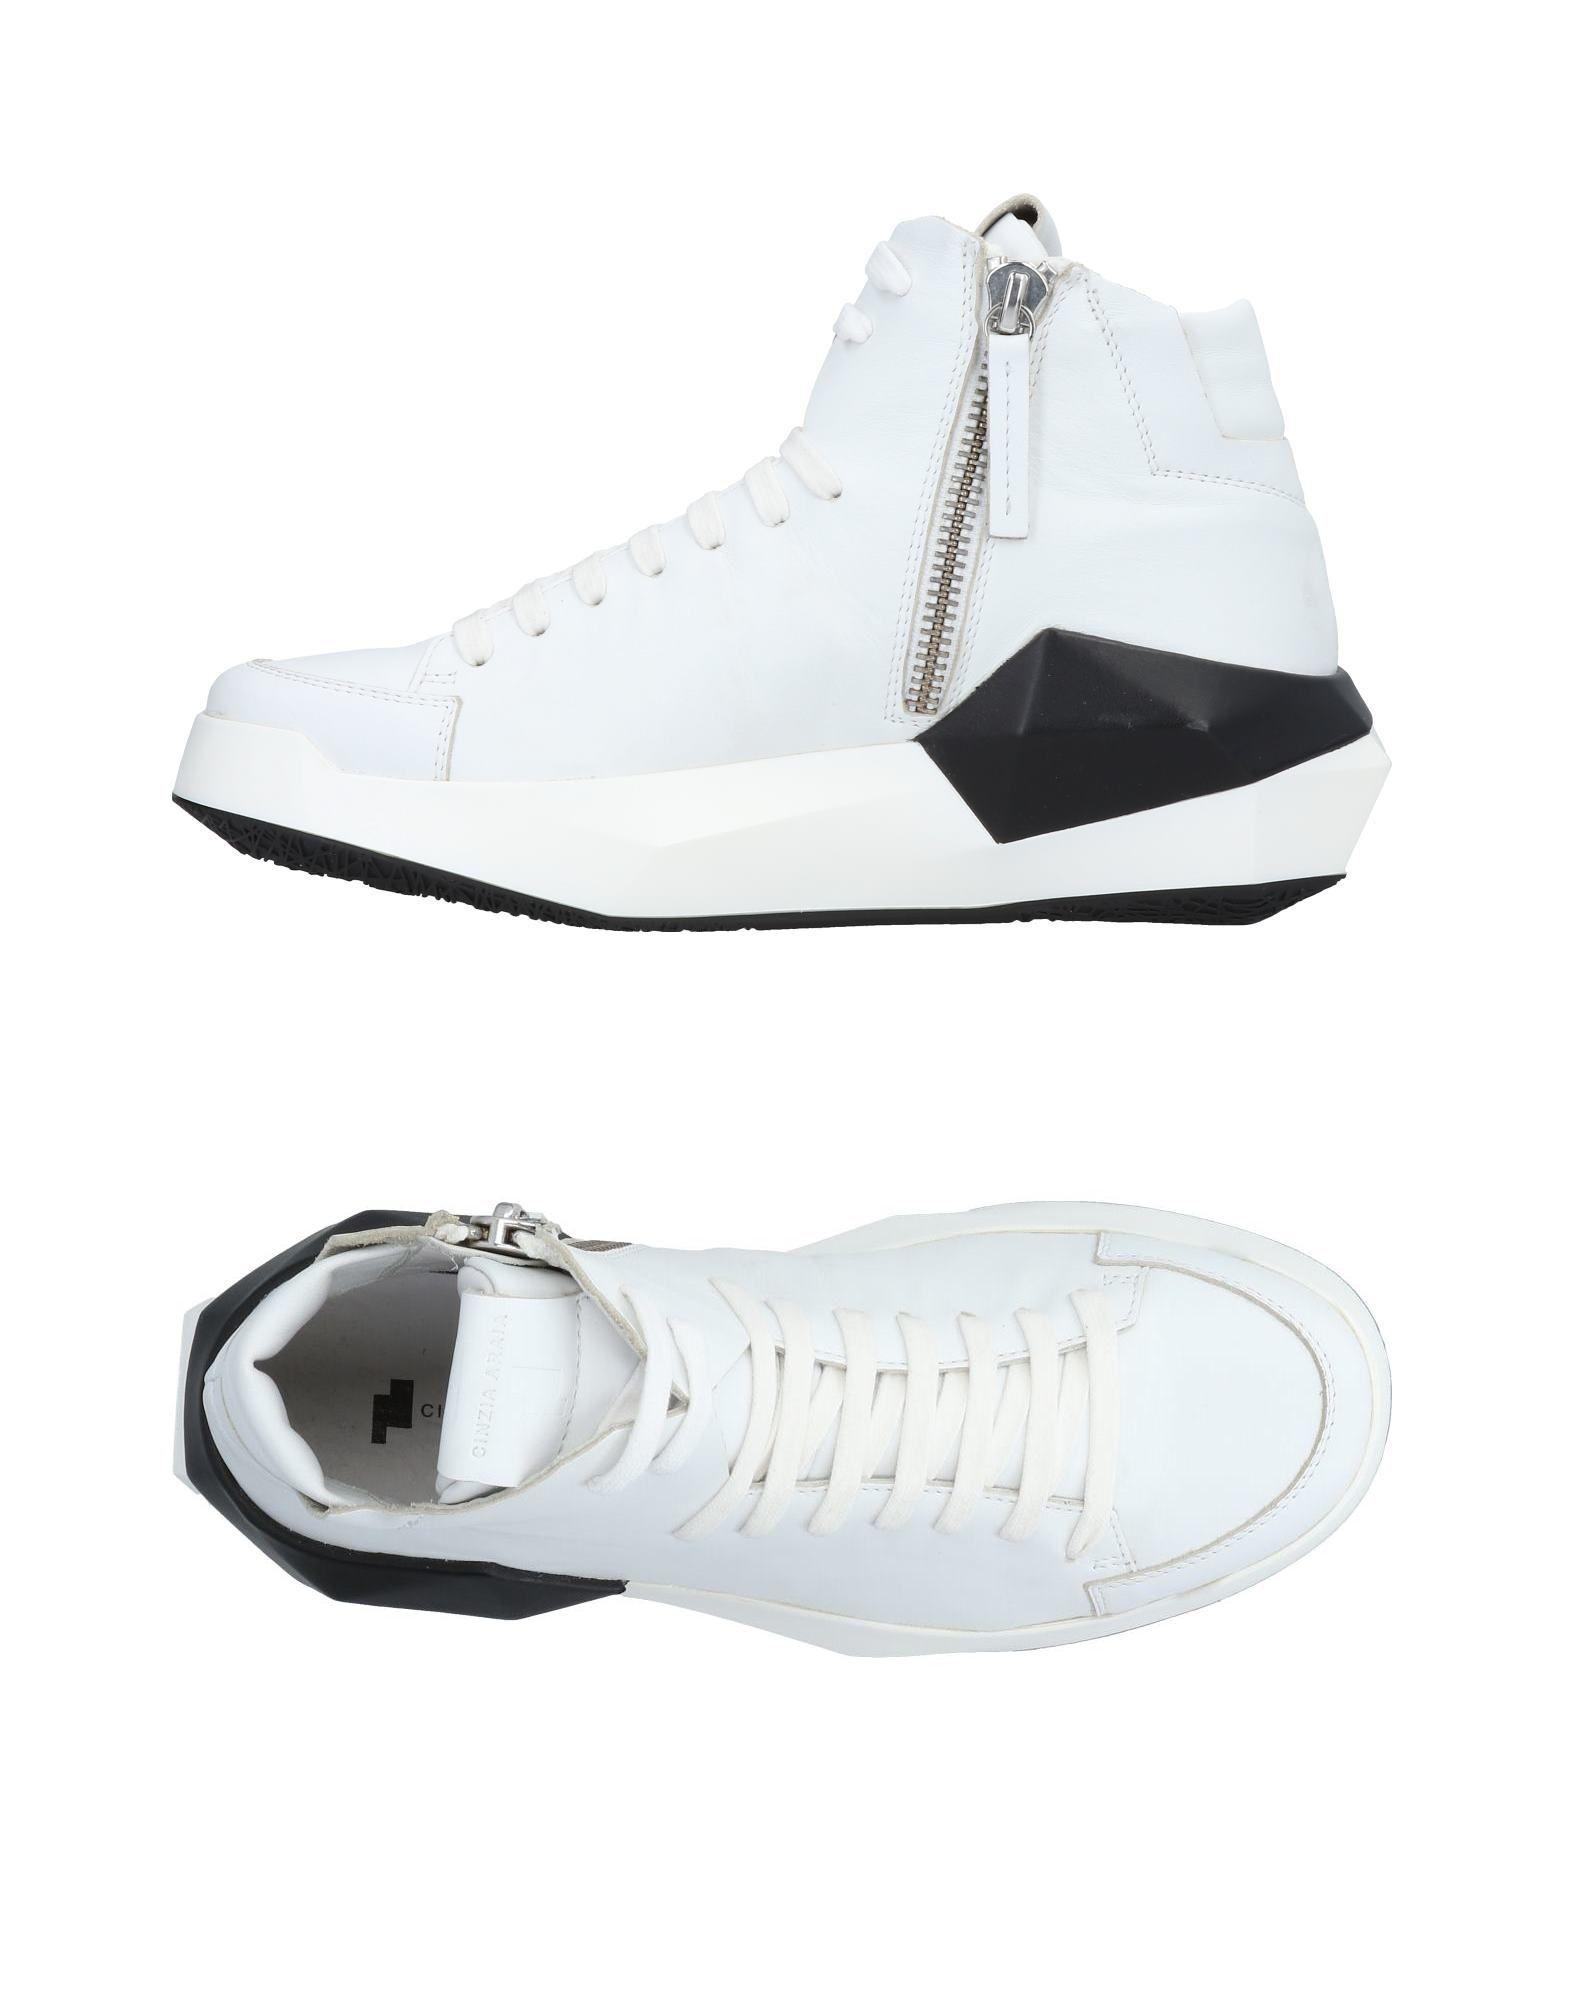 Cinzia Araia Sneakers Herren  11493935AF Gute Qualität beliebte Schuhe